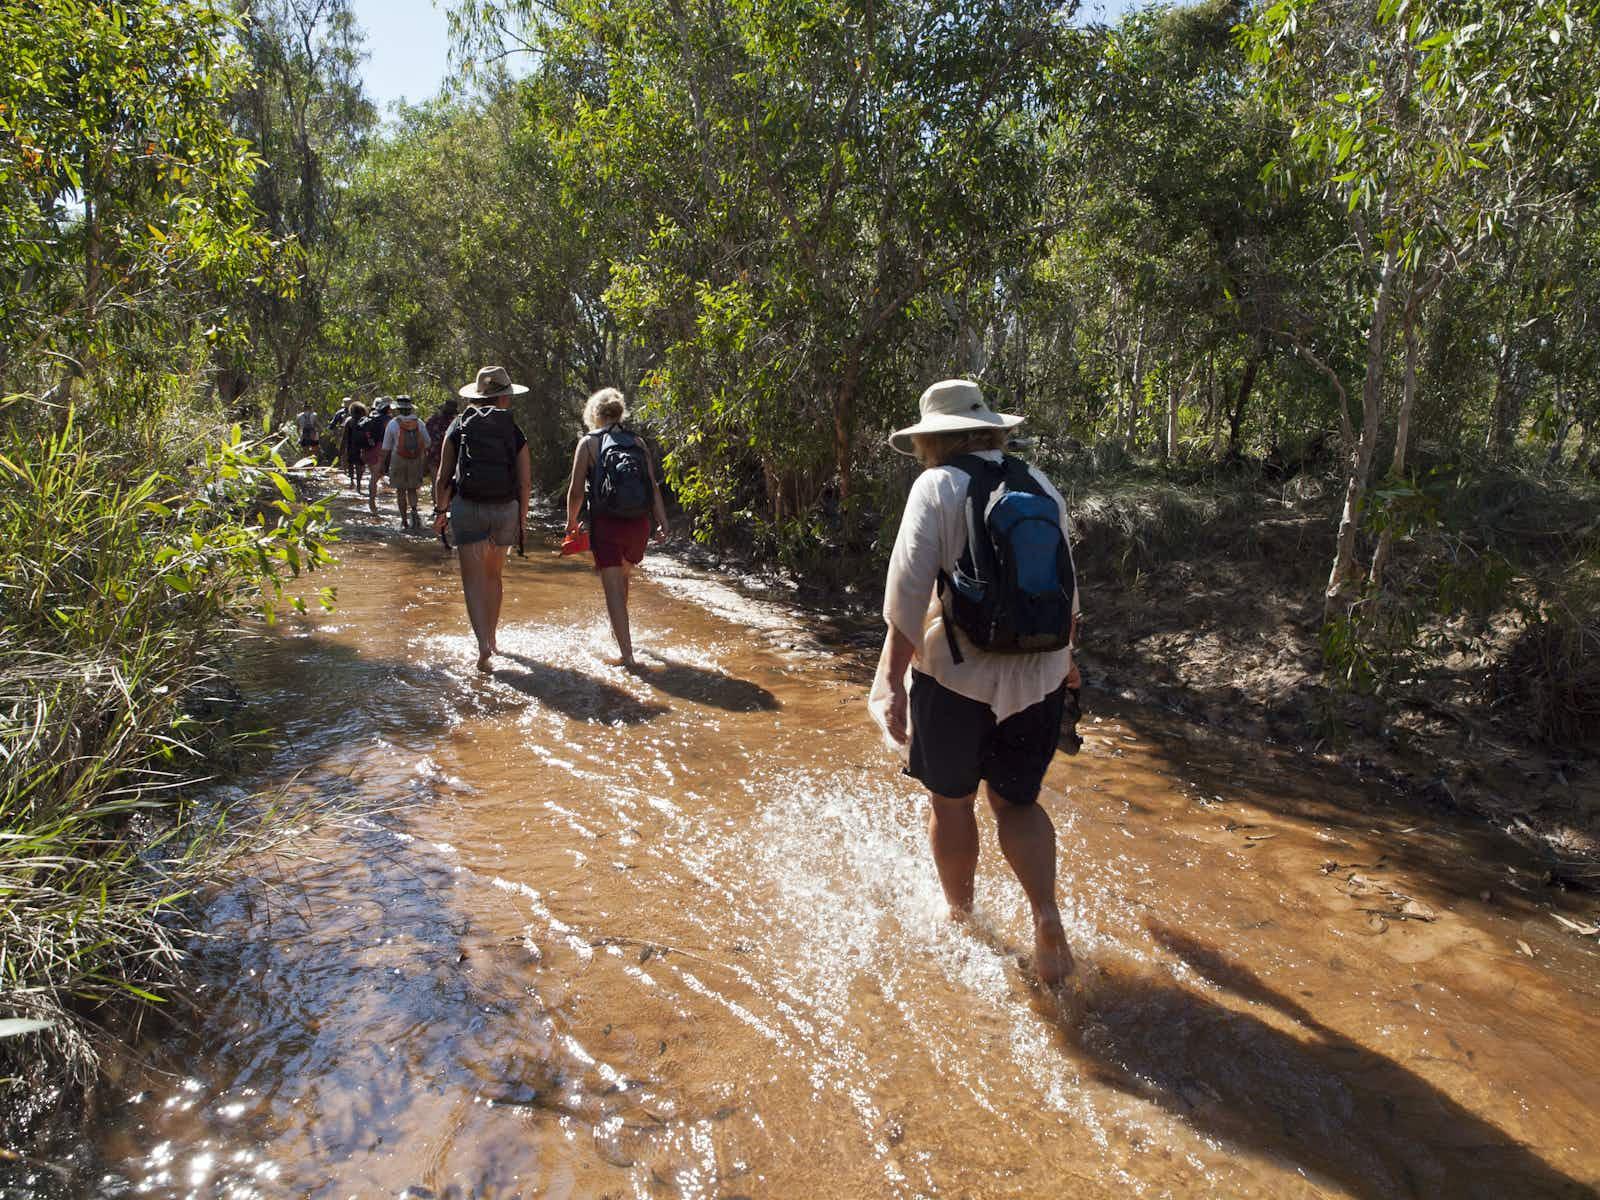 Walking in Western Australia on the Lurujarri Heritage Trail